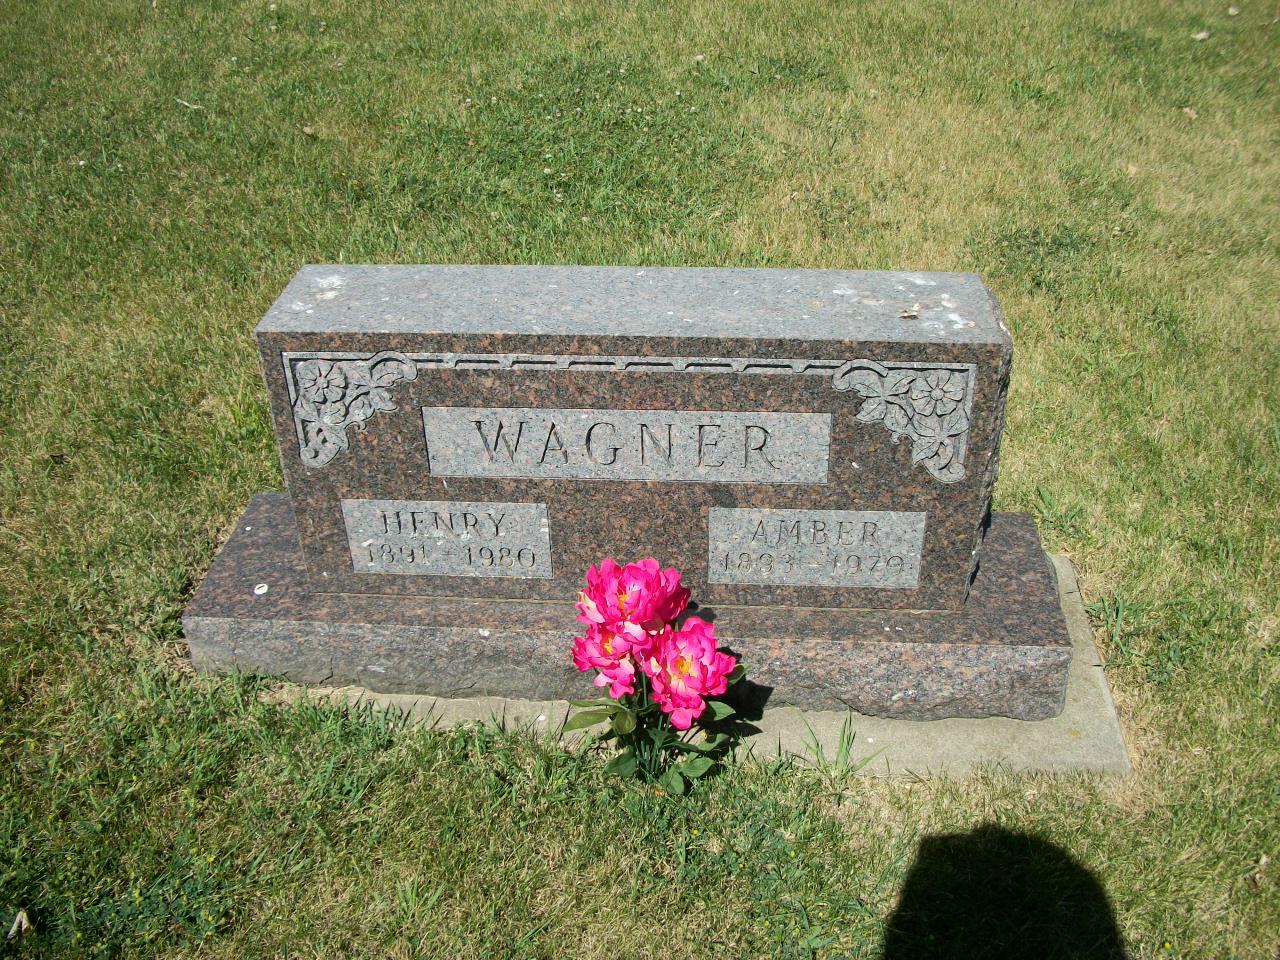 Henry Ferdinand Wagner